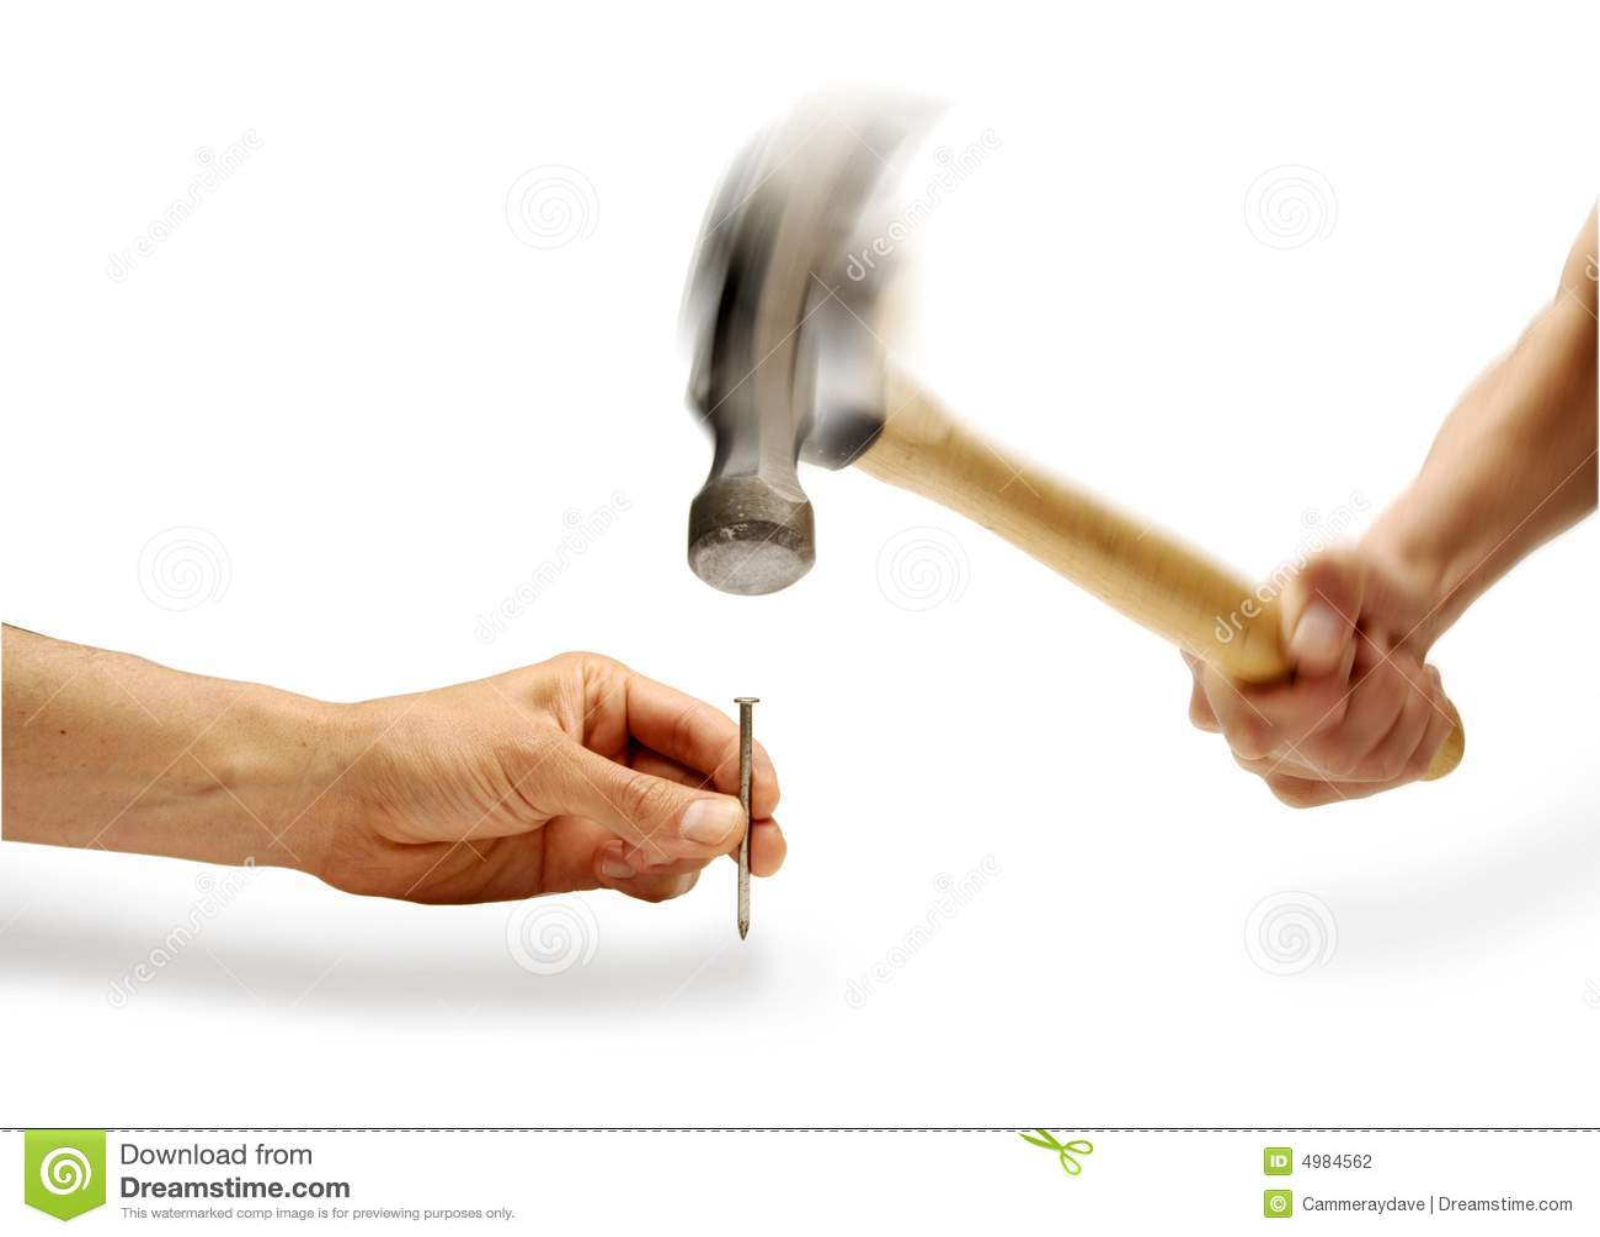 Hammer Hand Nail Holding